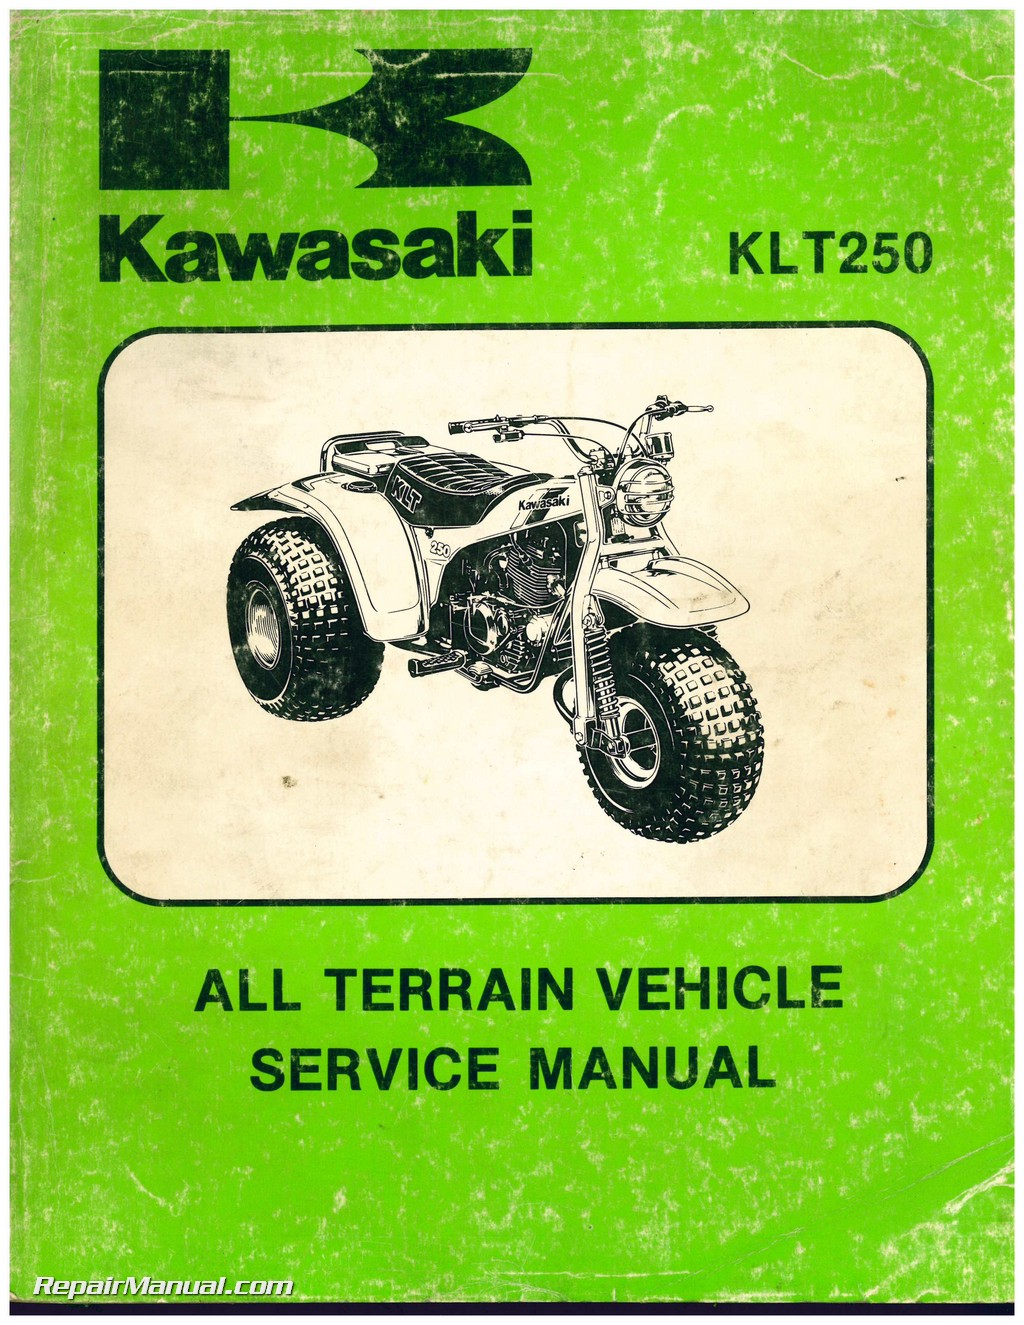 hight resolution of wrg 8579 1984 honda trx 250 wiring diagram 86 trx 250 wiring diagram 1982 kawasaki